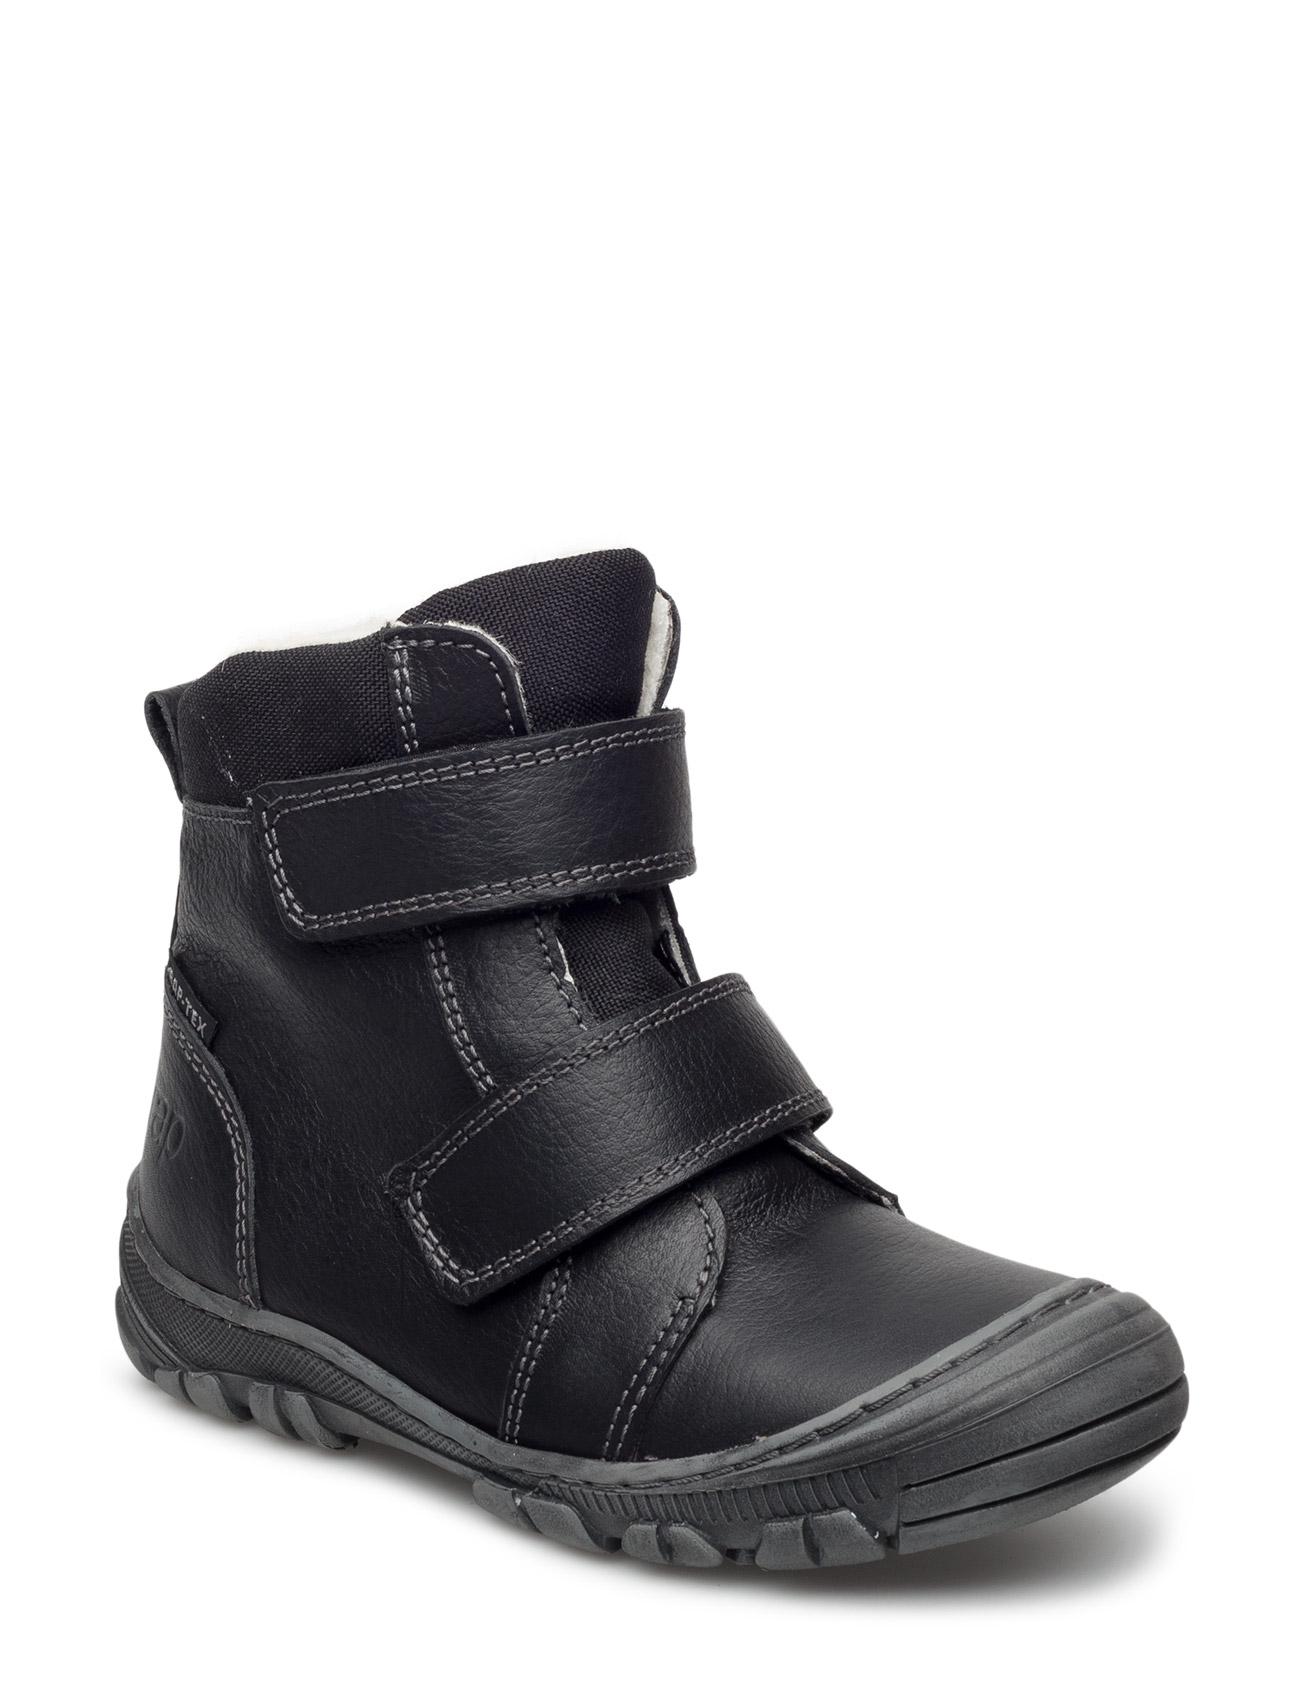 b4e3700e86eb Bestil Ecological Hand Made Water Proof Boot Arauto RAP Støvler i til Børn  i en online fashion store